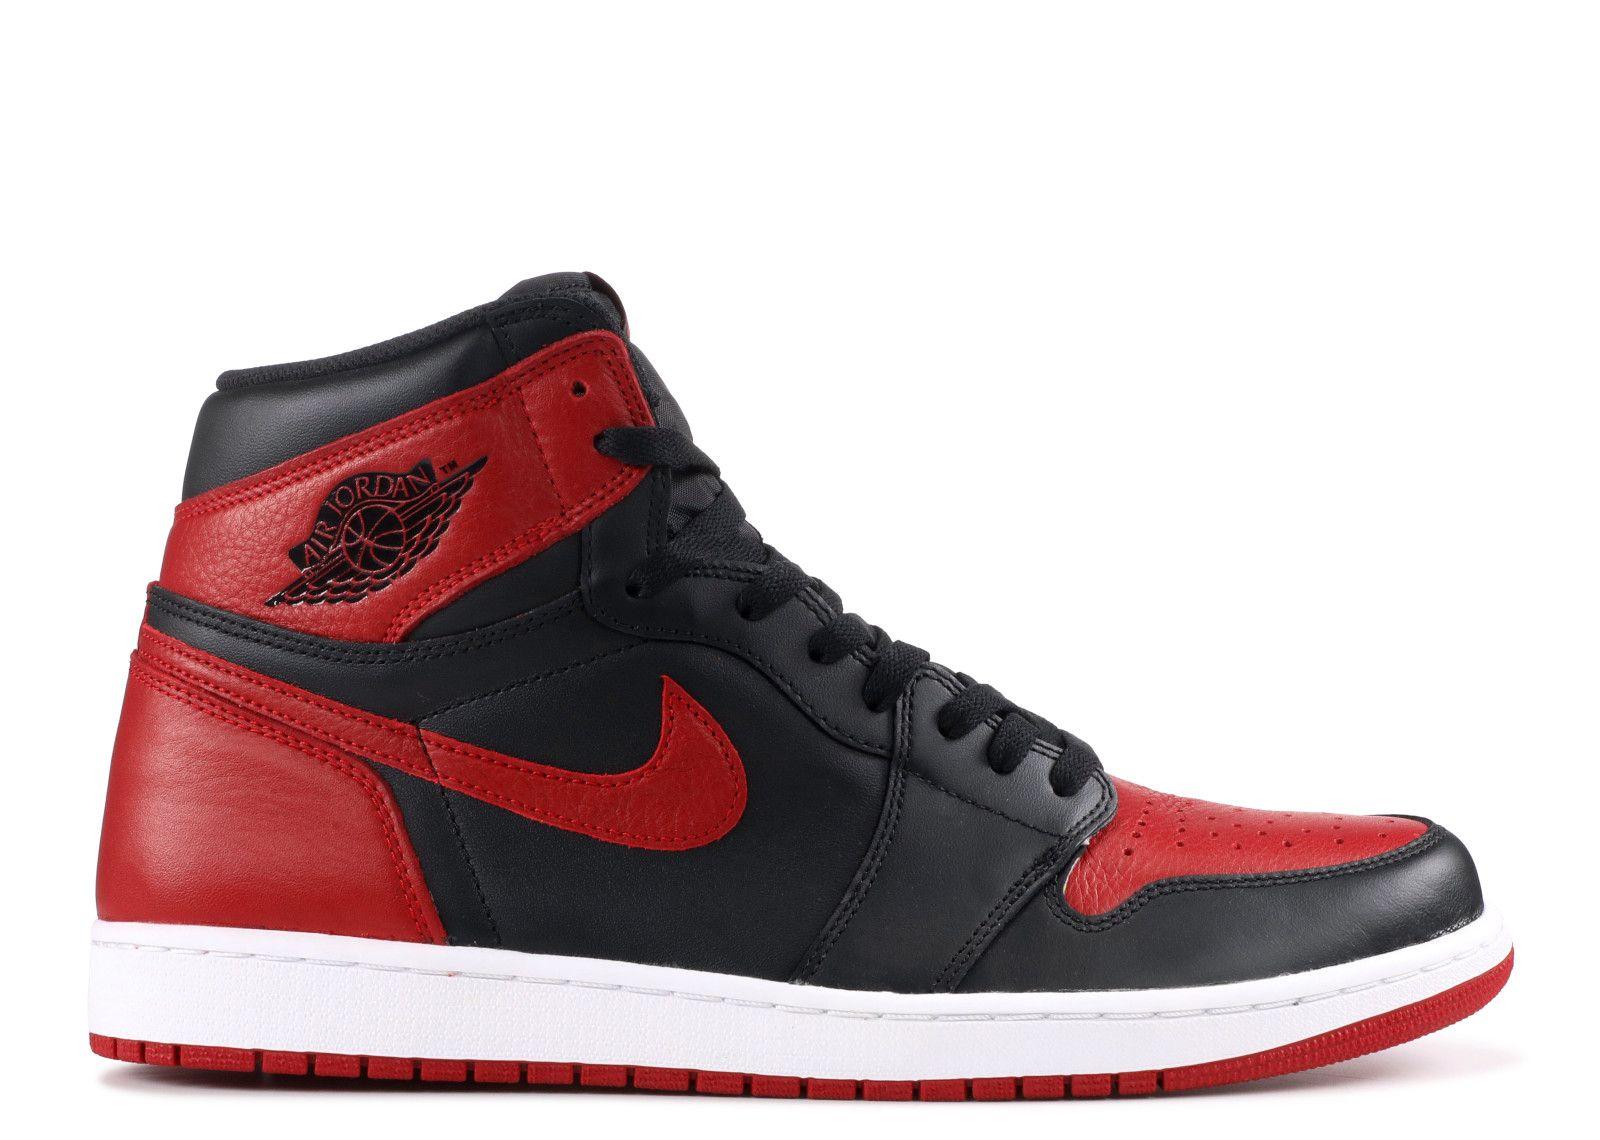 Air Jordan 1 Retro High Og Banned 2016 Release Air Jordans